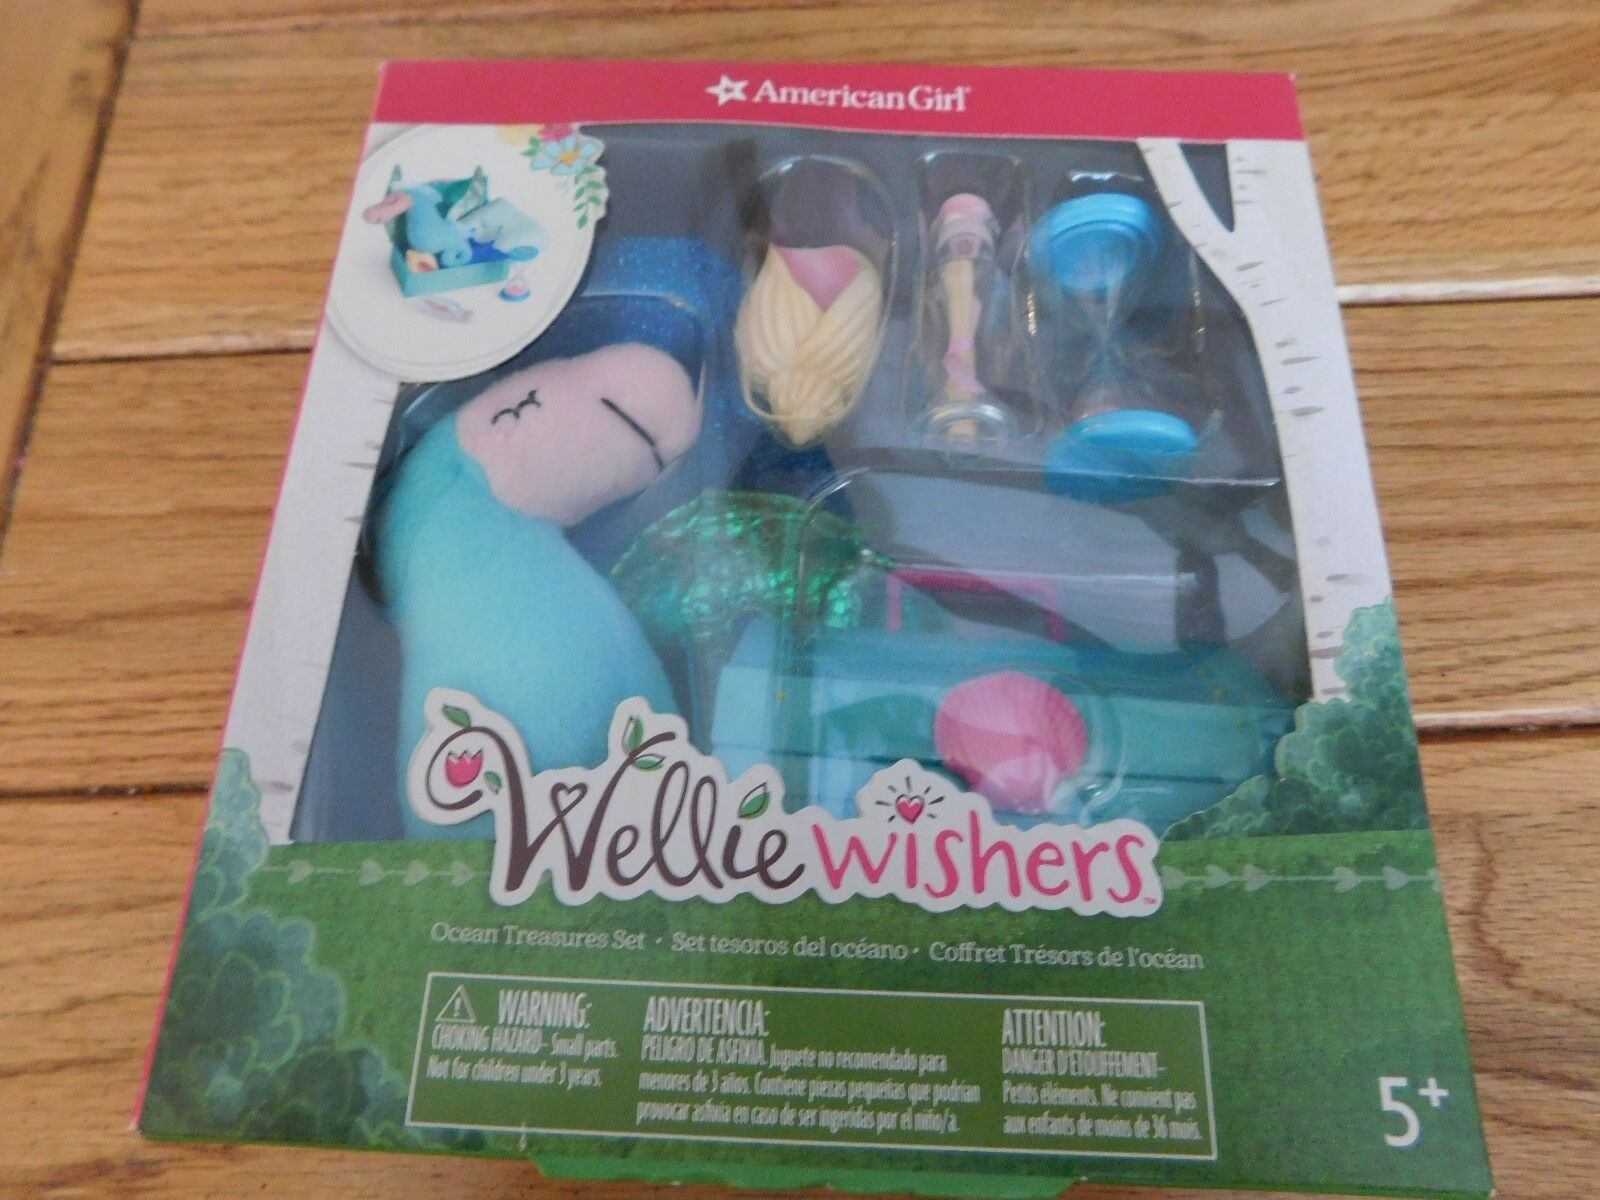 AMERICAN GIRL WELLIE WISHERS OCEAN TREASURES SET NEW IN BOX RETIRED FREE SHIP